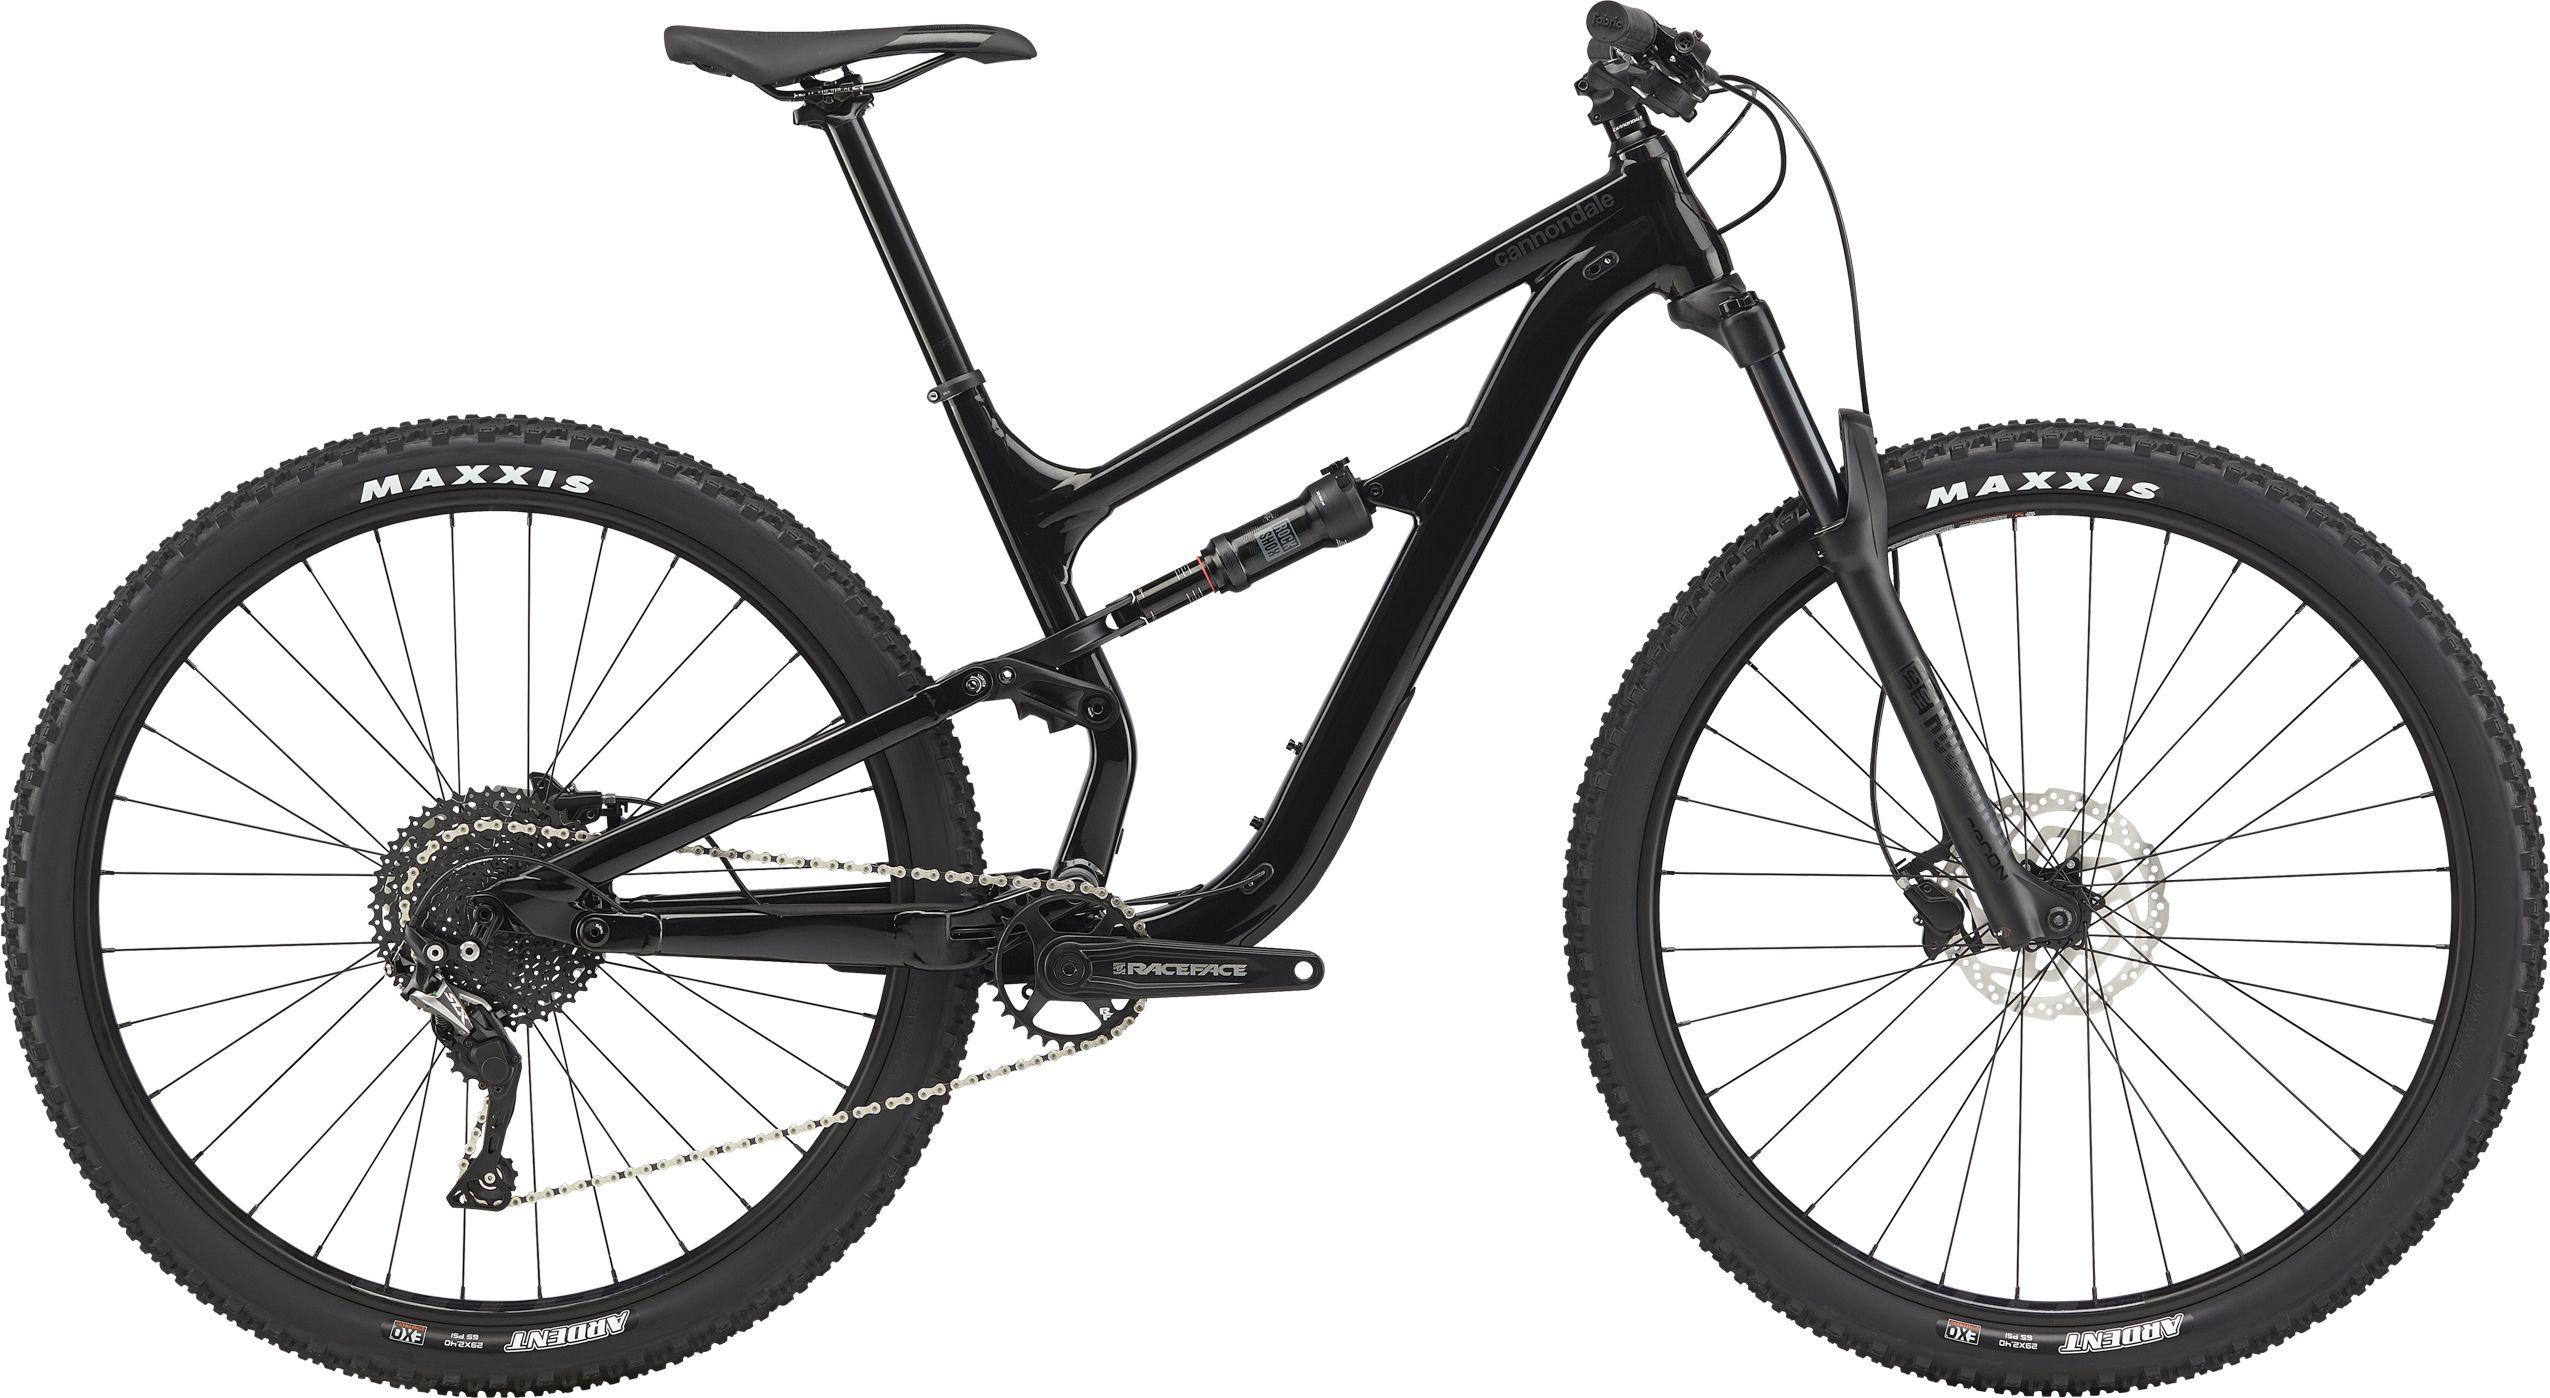 Cannondale Habit 6 29er Mountain Bike 2020 | Mountainbikes